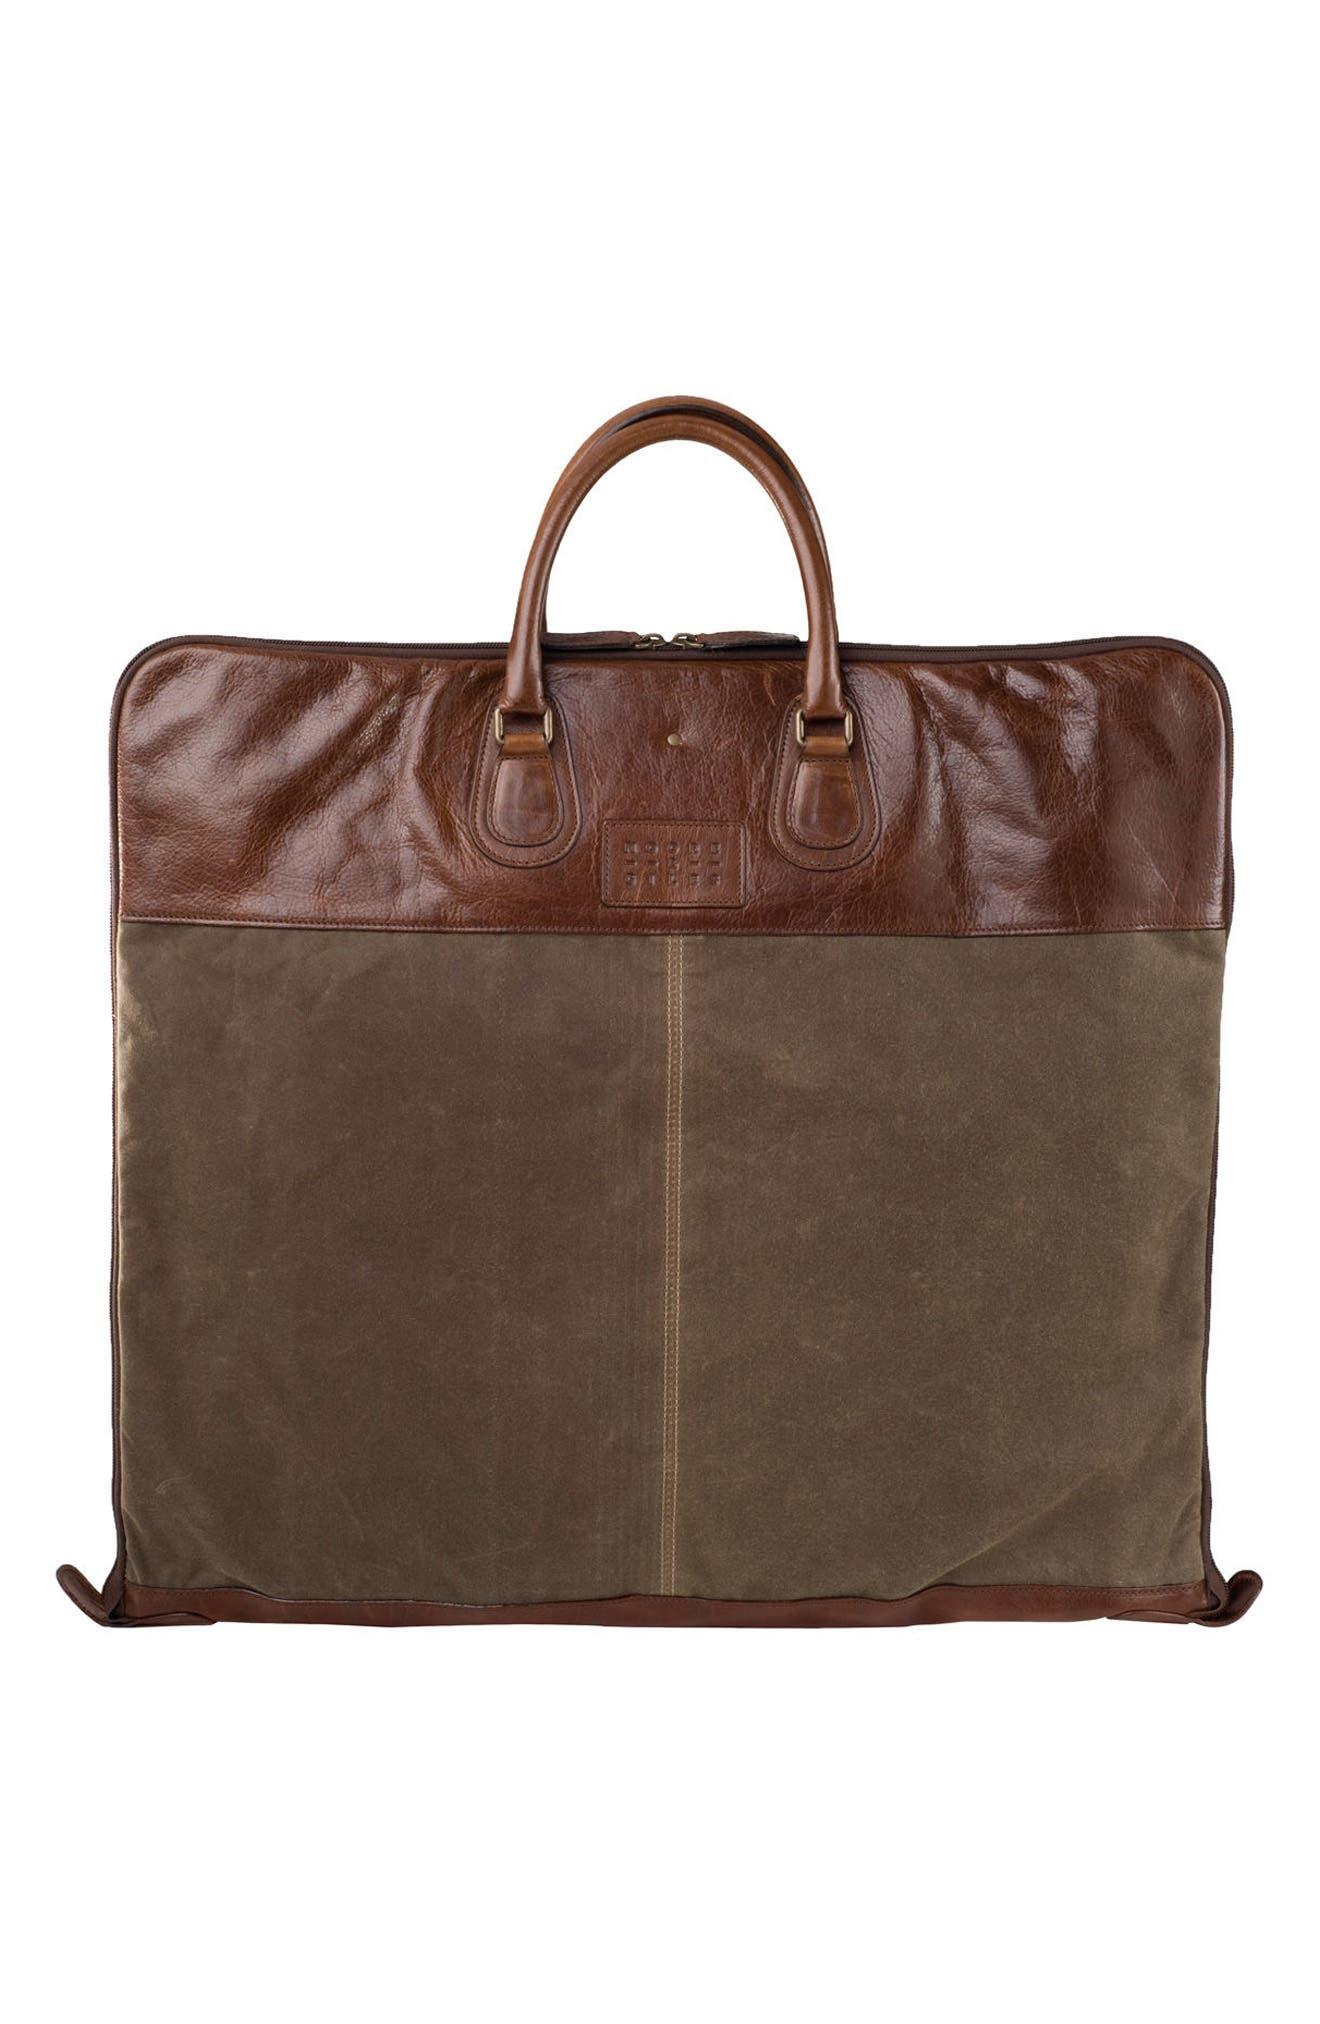 Gravely Garment Bag,                         Main,                         color, WAXWEAR RANGERTAN